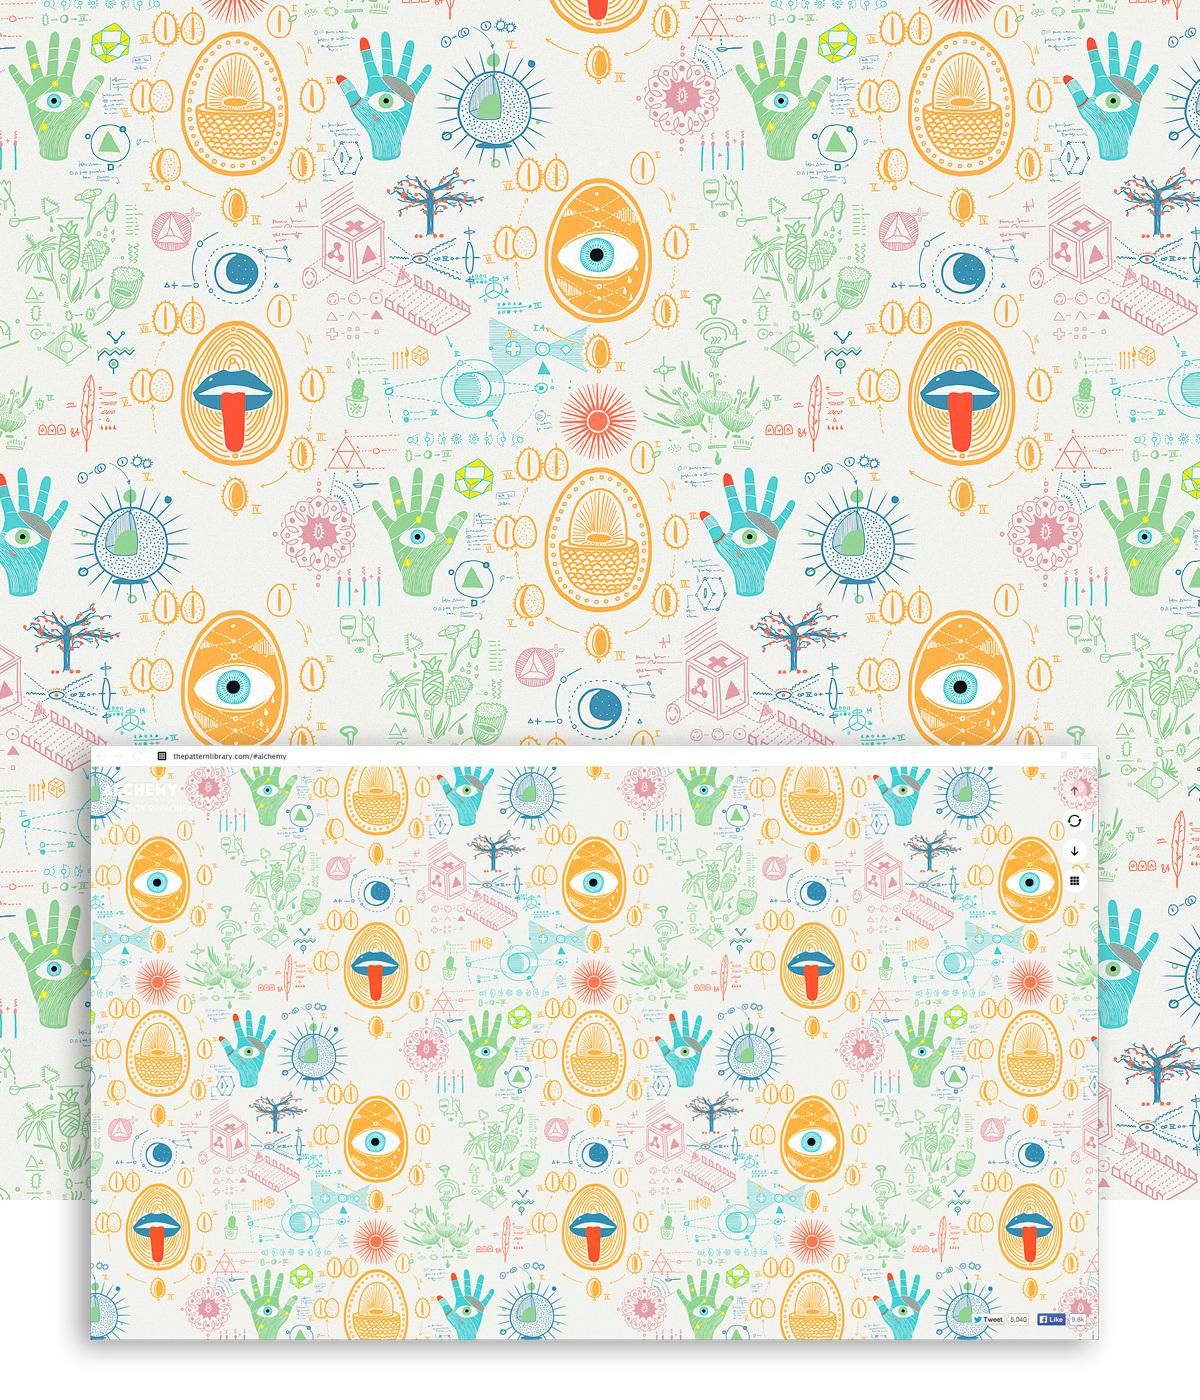 Pattern Library - Anton Repponen - Museum of Design Artifacts